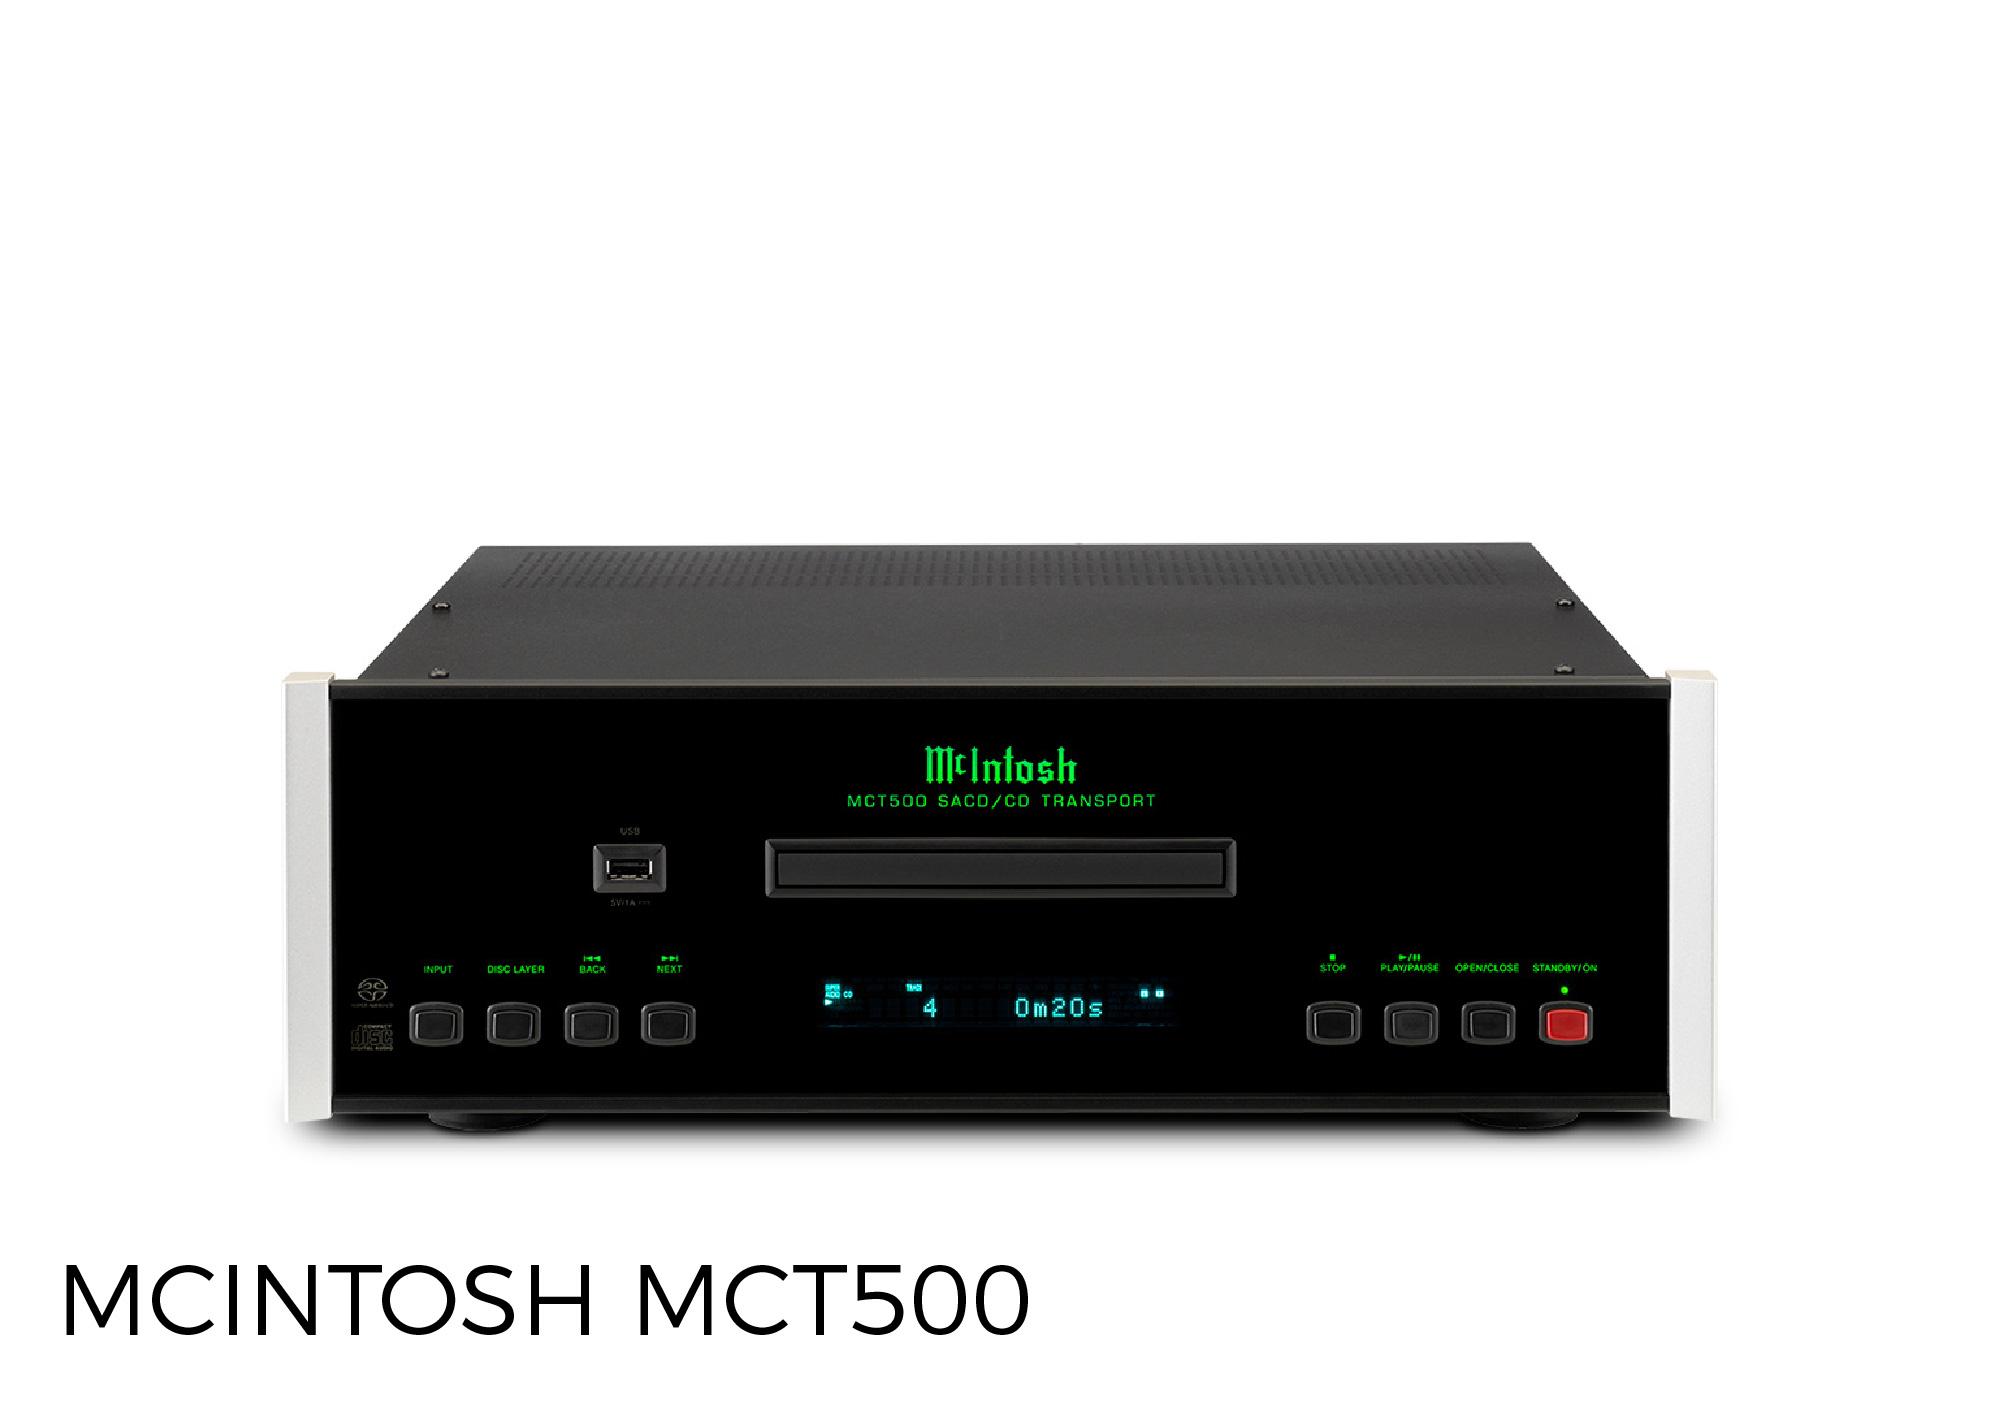 MCINTOSH MCT500 DONG THANH HOA PHUC